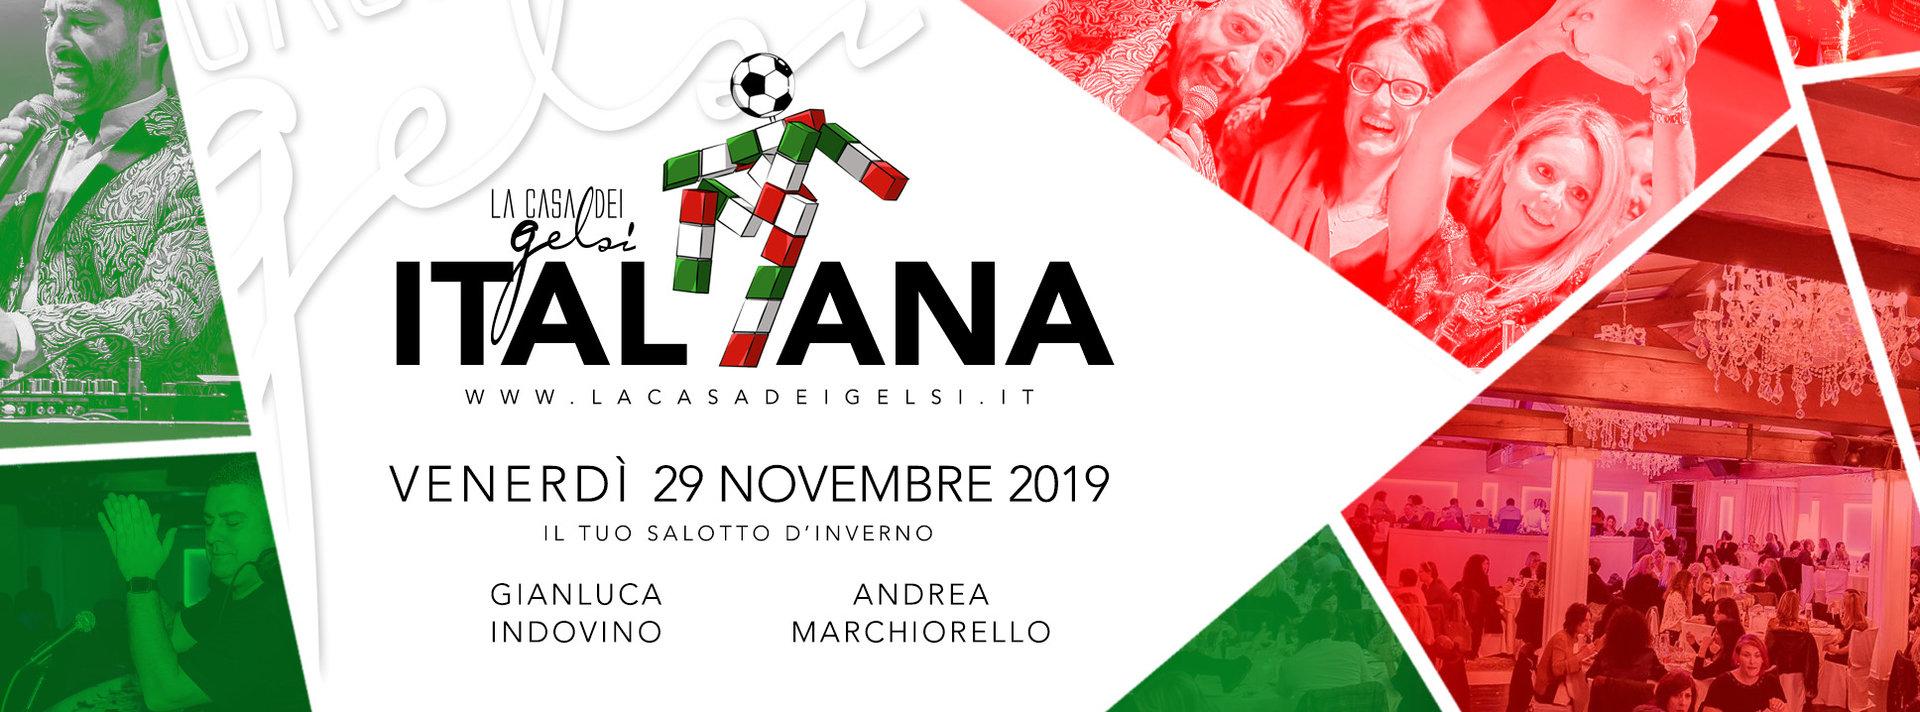 Italiana Gelsi - 29 novembre 2019